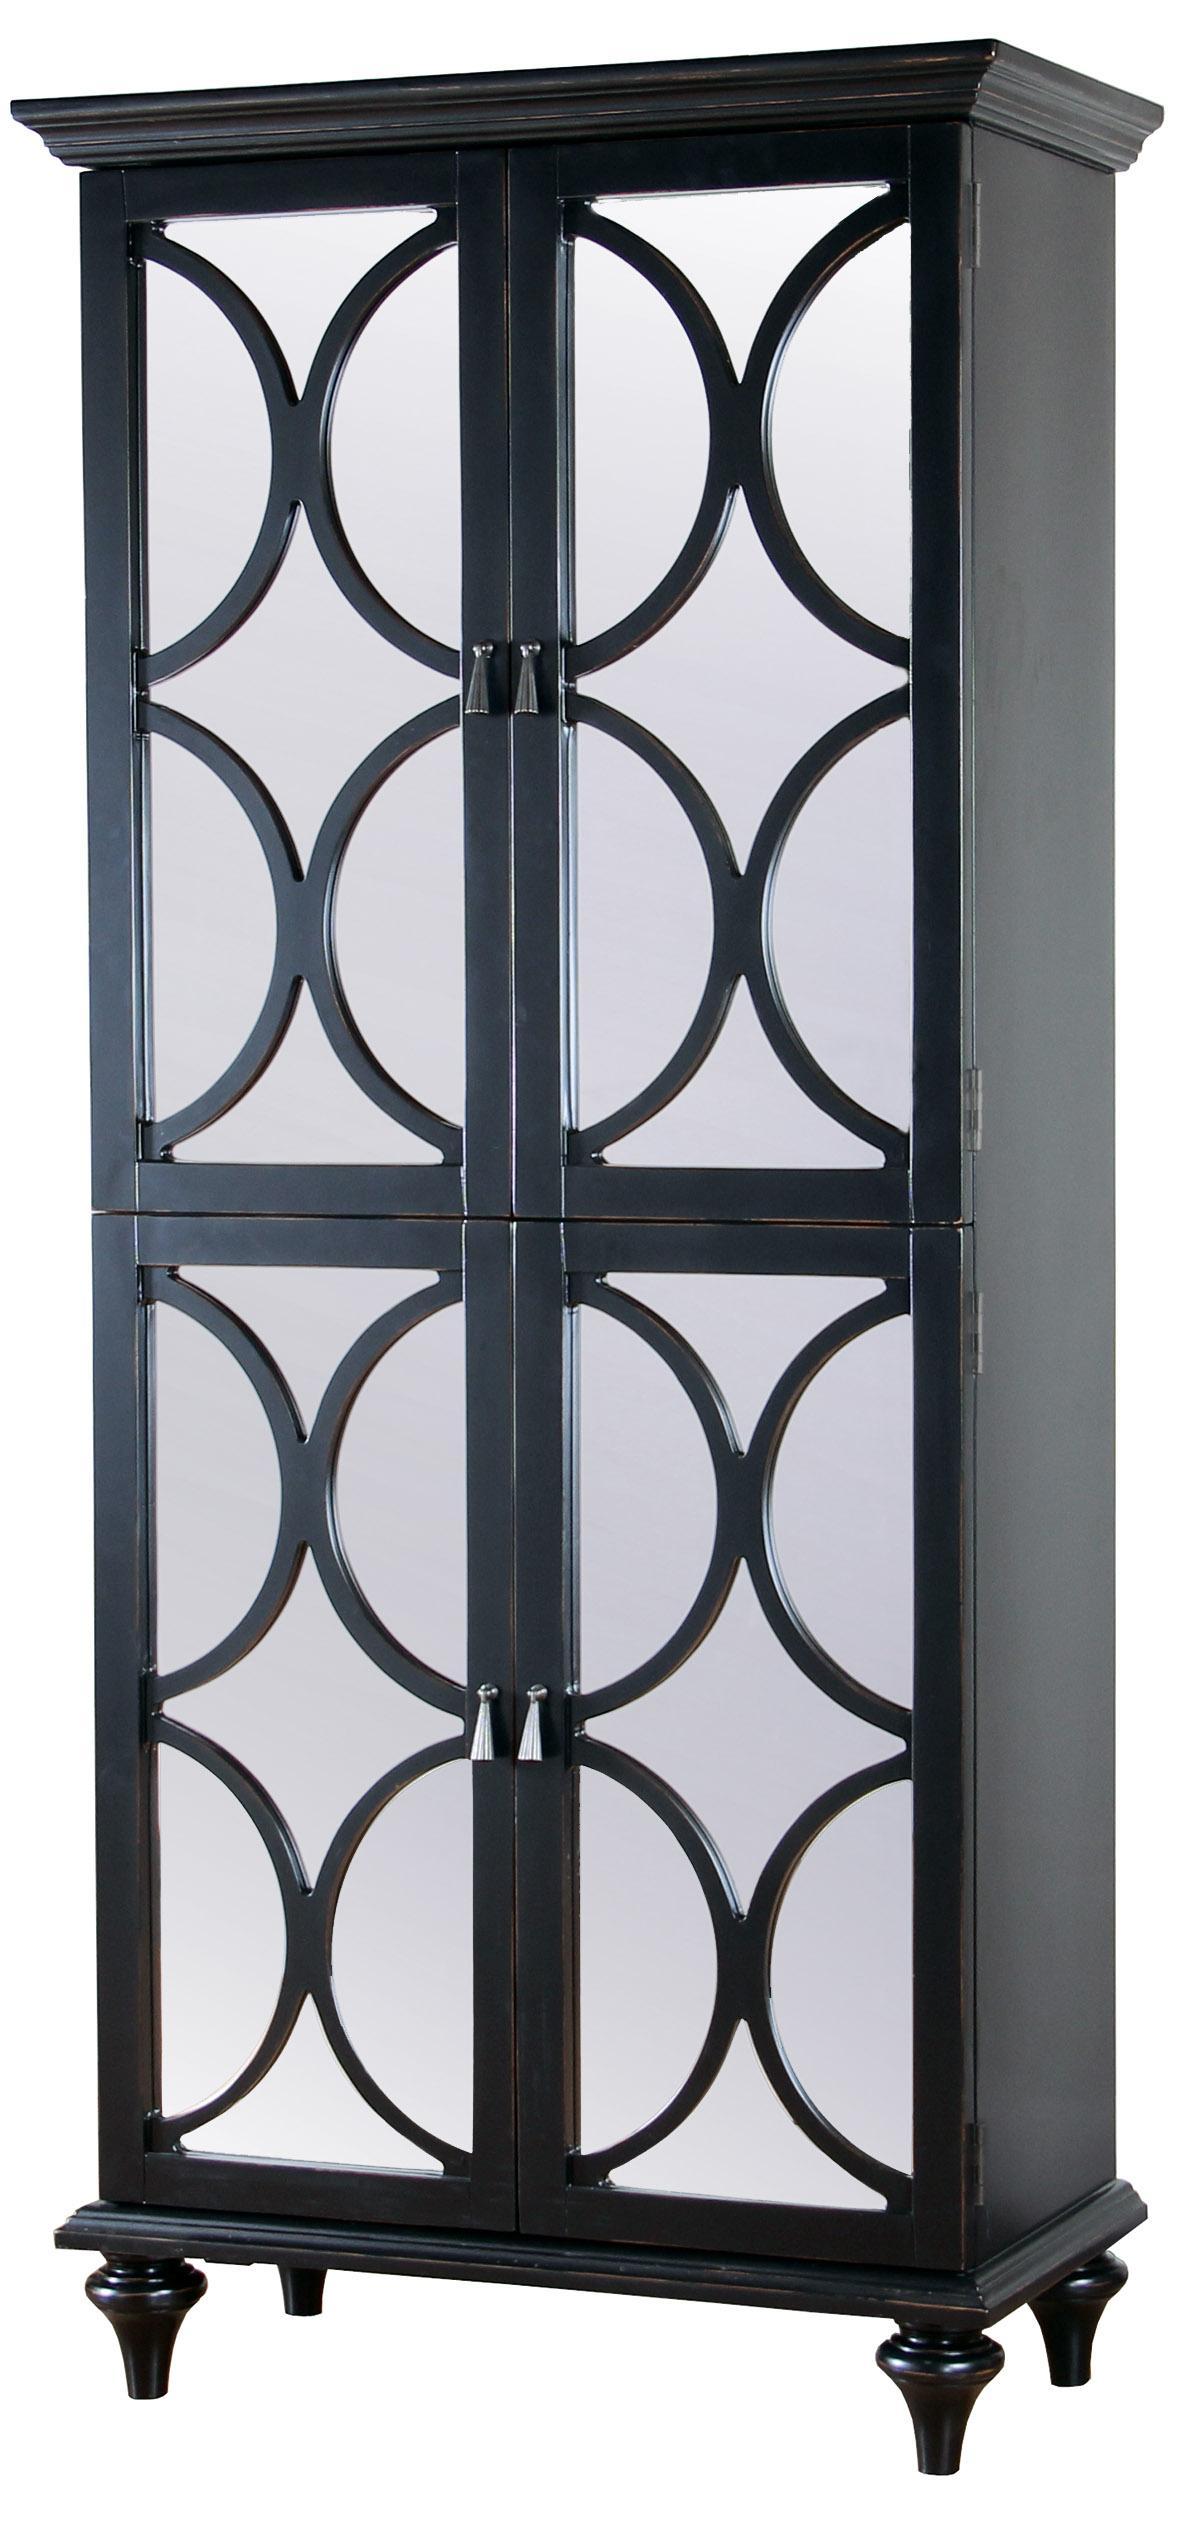 Pulaski Furniture Accents 549237 Alannis Wine Cabinet   Baeru0027s Furniture    Wine Racks/Wine Cabinets